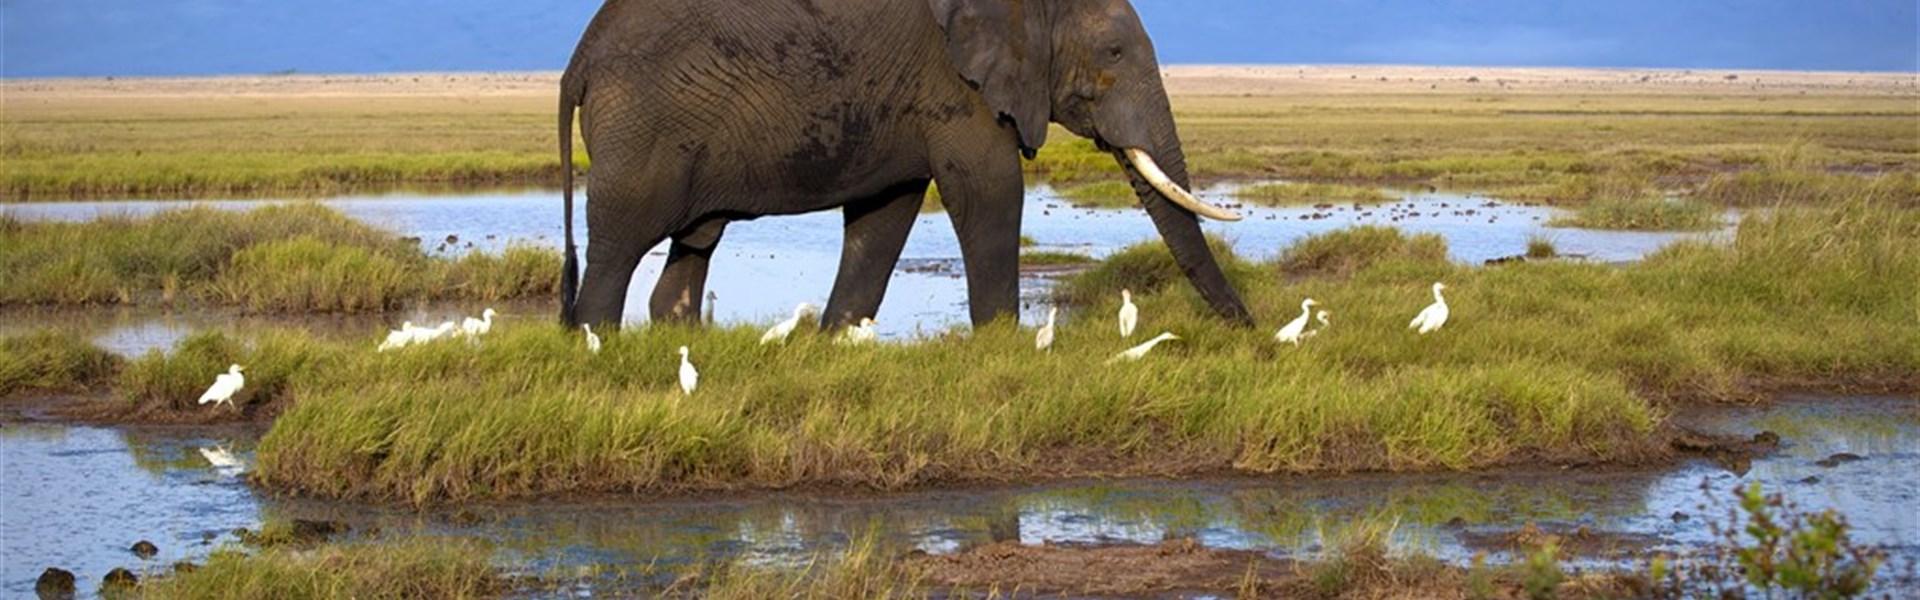 Safari ve stínu Kilimanjara a pobyt u moře na Diani Beach - Safari v Keni s Marco Polo_Amboseli